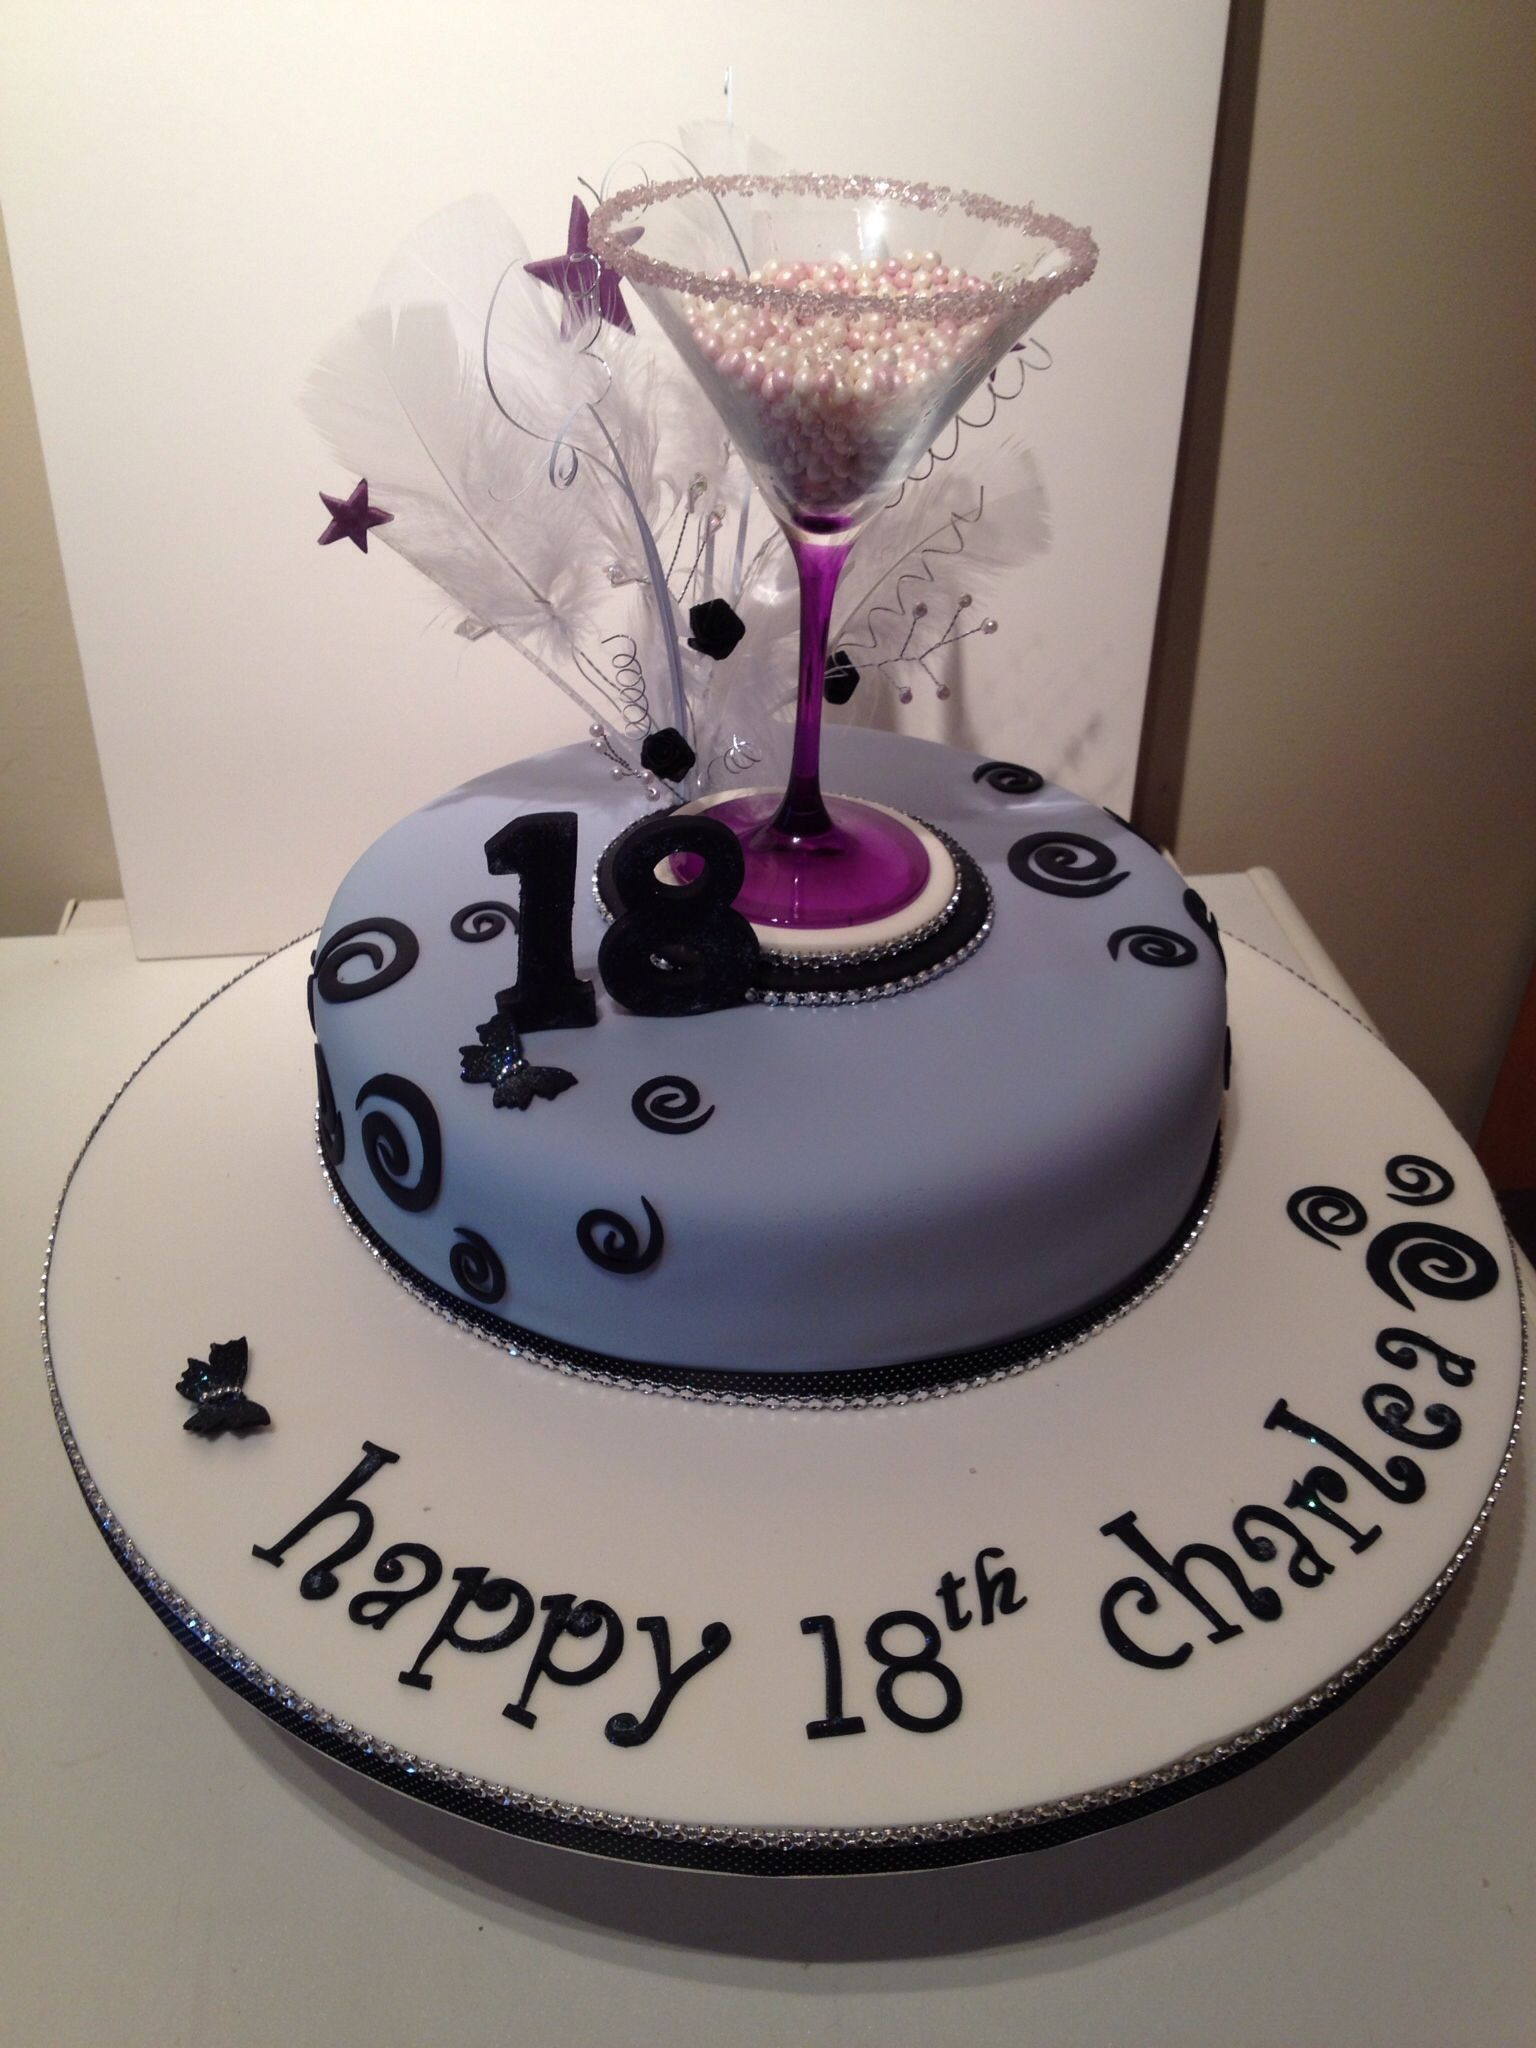 Phenomenal 18 Birthday Cake 18Th Birthday Cake Recipes Pinterest 18Th Funny Birthday Cards Online Alyptdamsfinfo